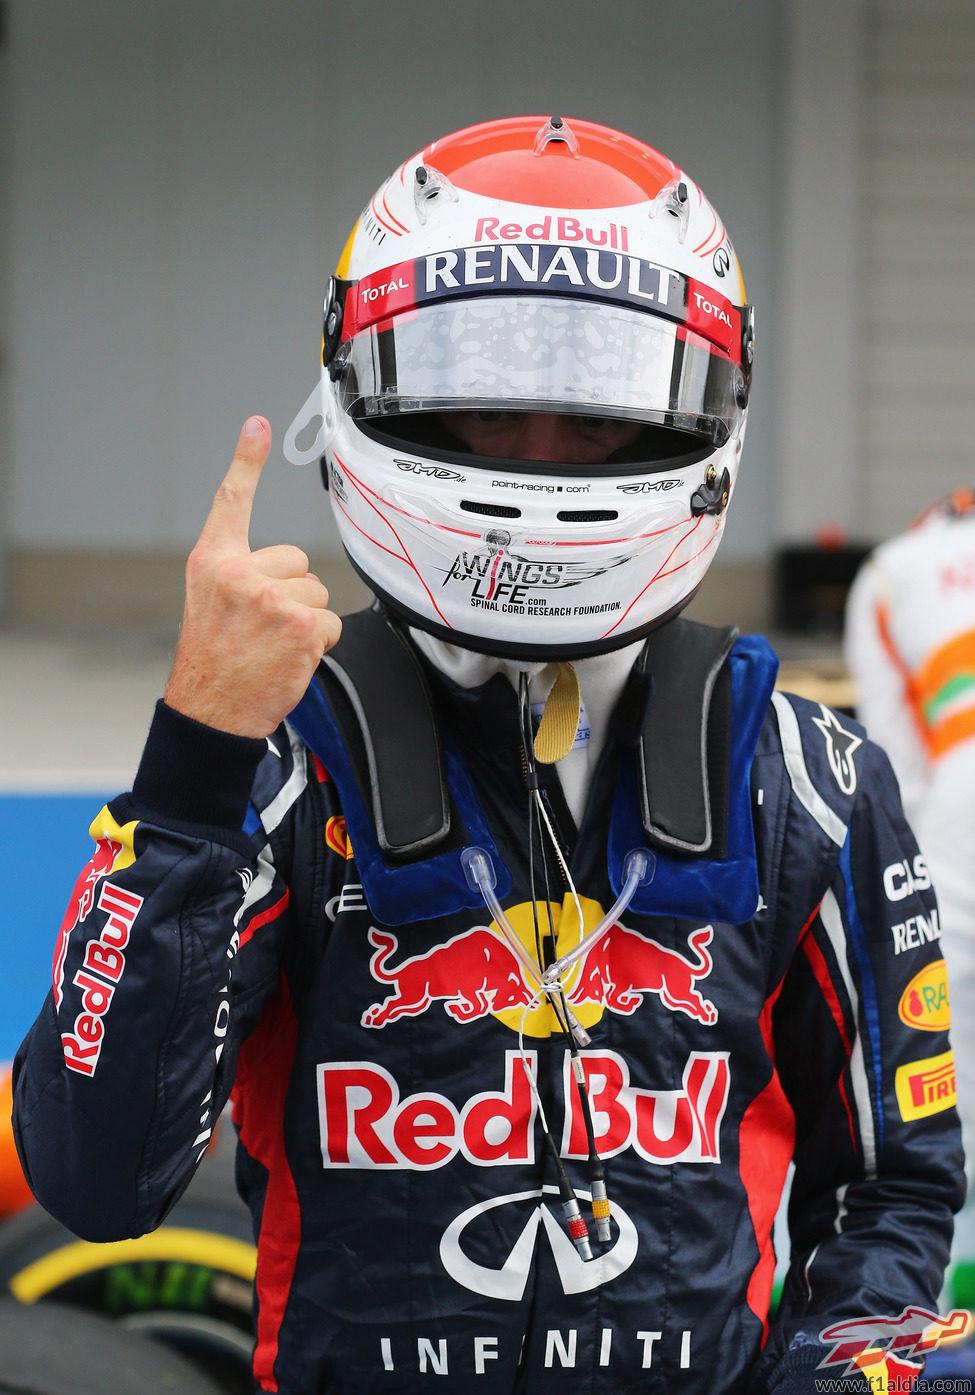 Sebastian Vettel logra la 'pole' en el GP de Japón 2012